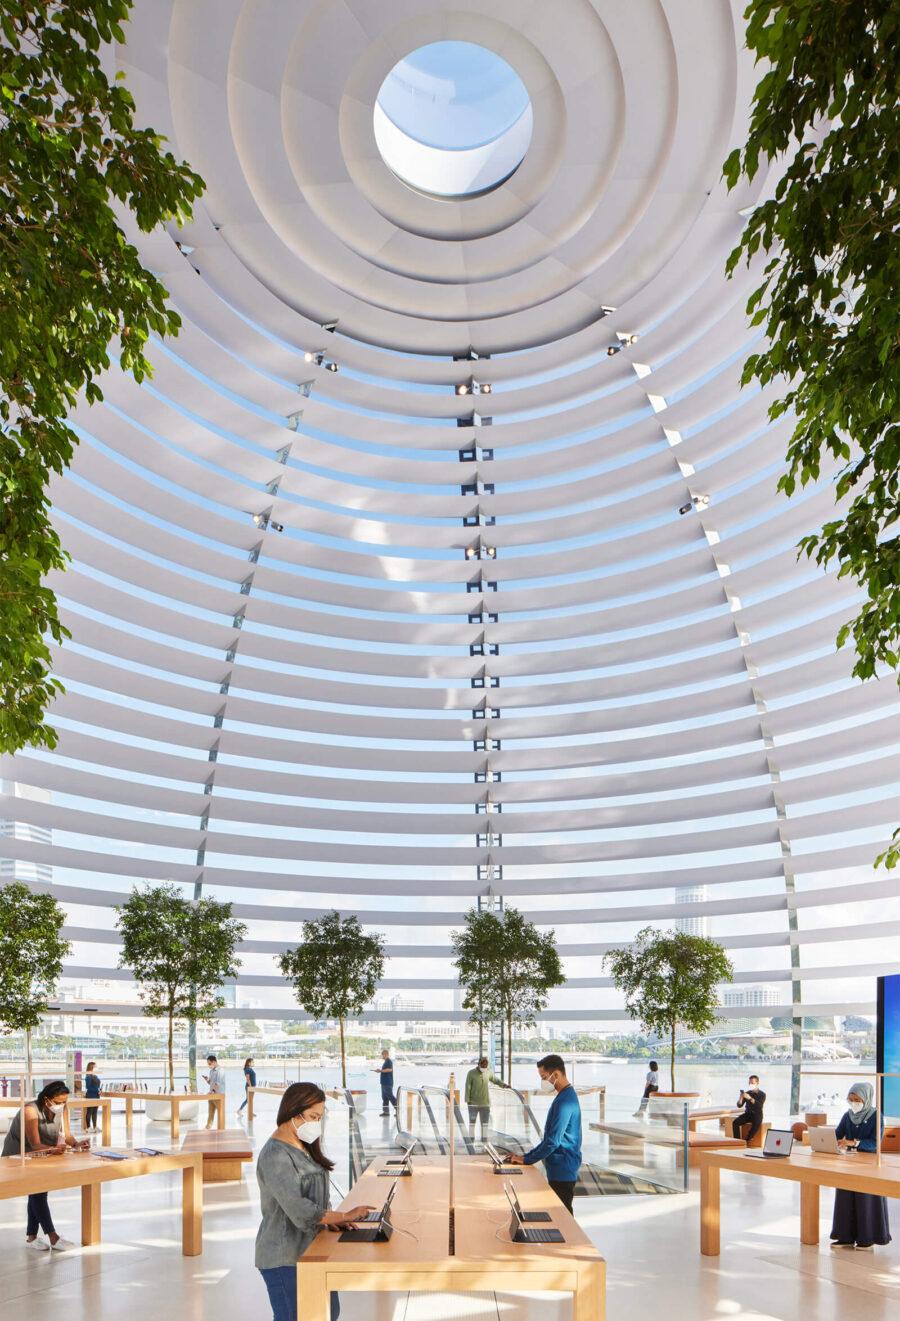 Apple NSO Marina Bay Sands oculus, Singapore